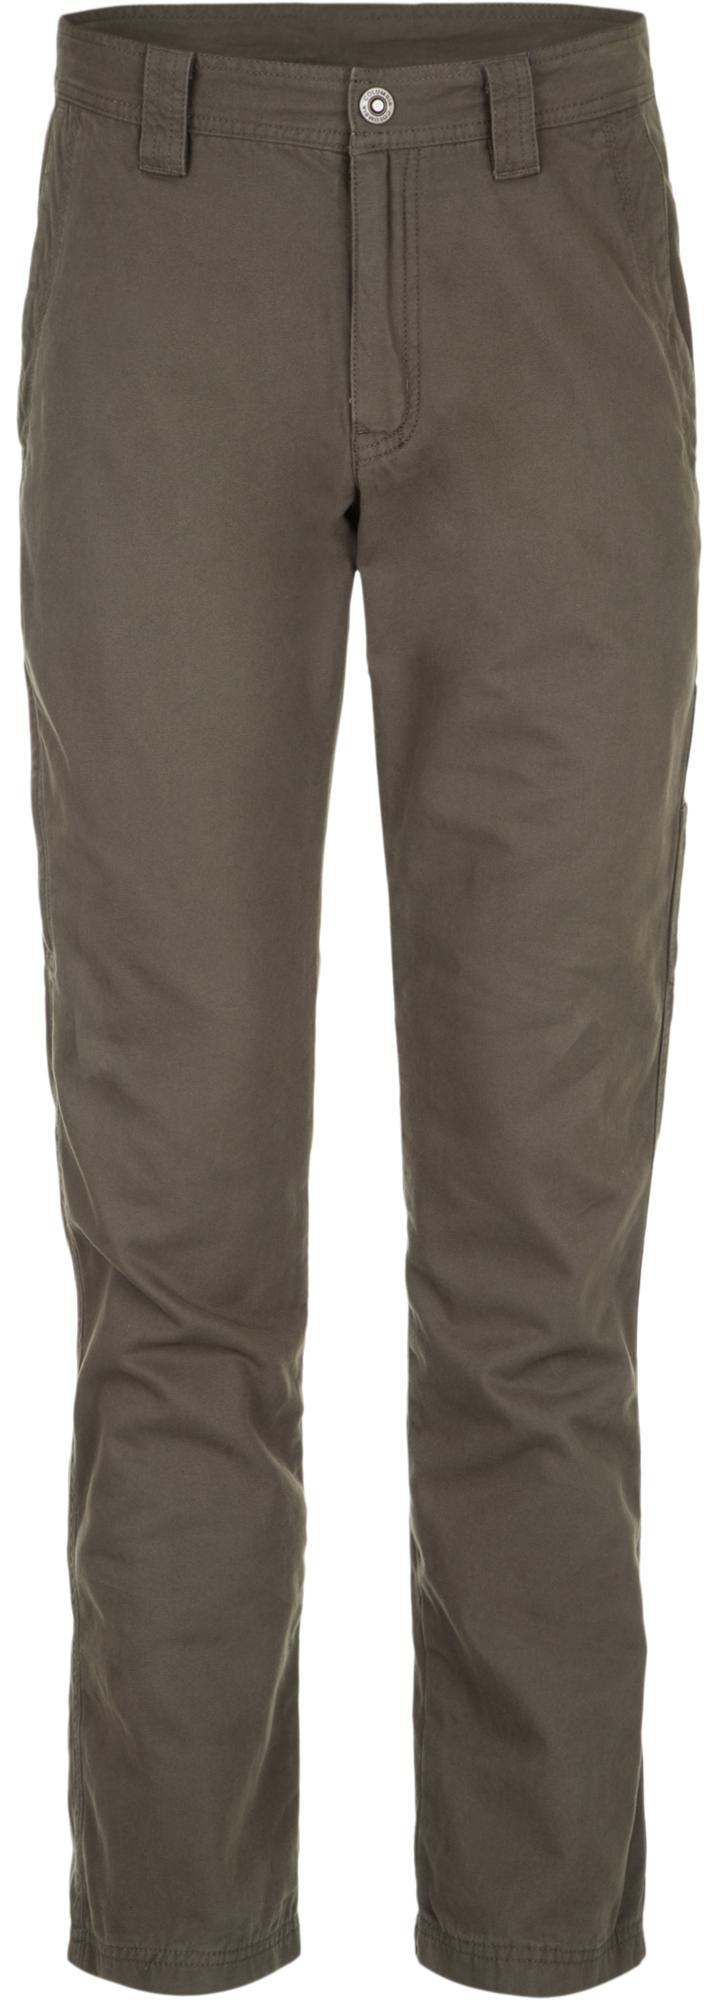 Columbia Брюки утепленные мужские Columbia Roc Lined 5, размер 54-34 брюки спортивные мужские columbia bridge to bluff цвет серо синий 1578203 028 размер 38 54